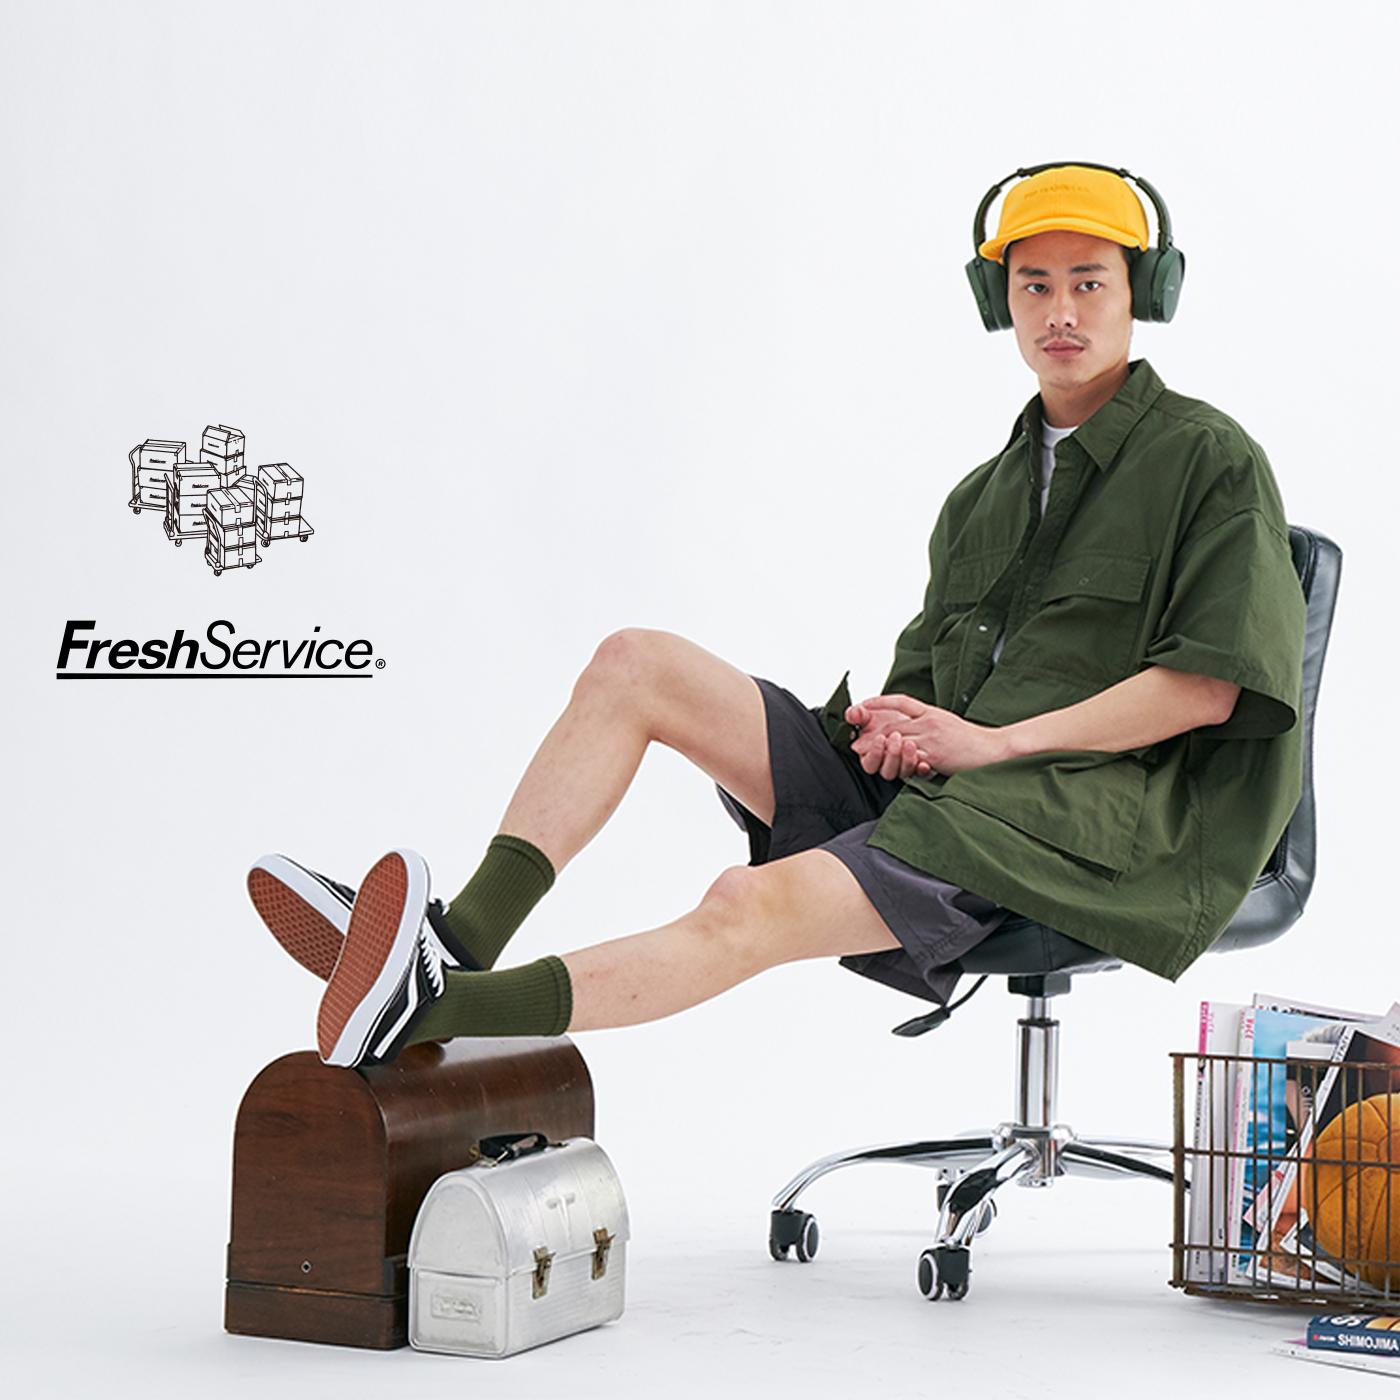 fresh service,fresh service clothing,fresh service dickies,fresh service jp,選物店,選物,貨運,南貴之,運送会社,fresh service 通販